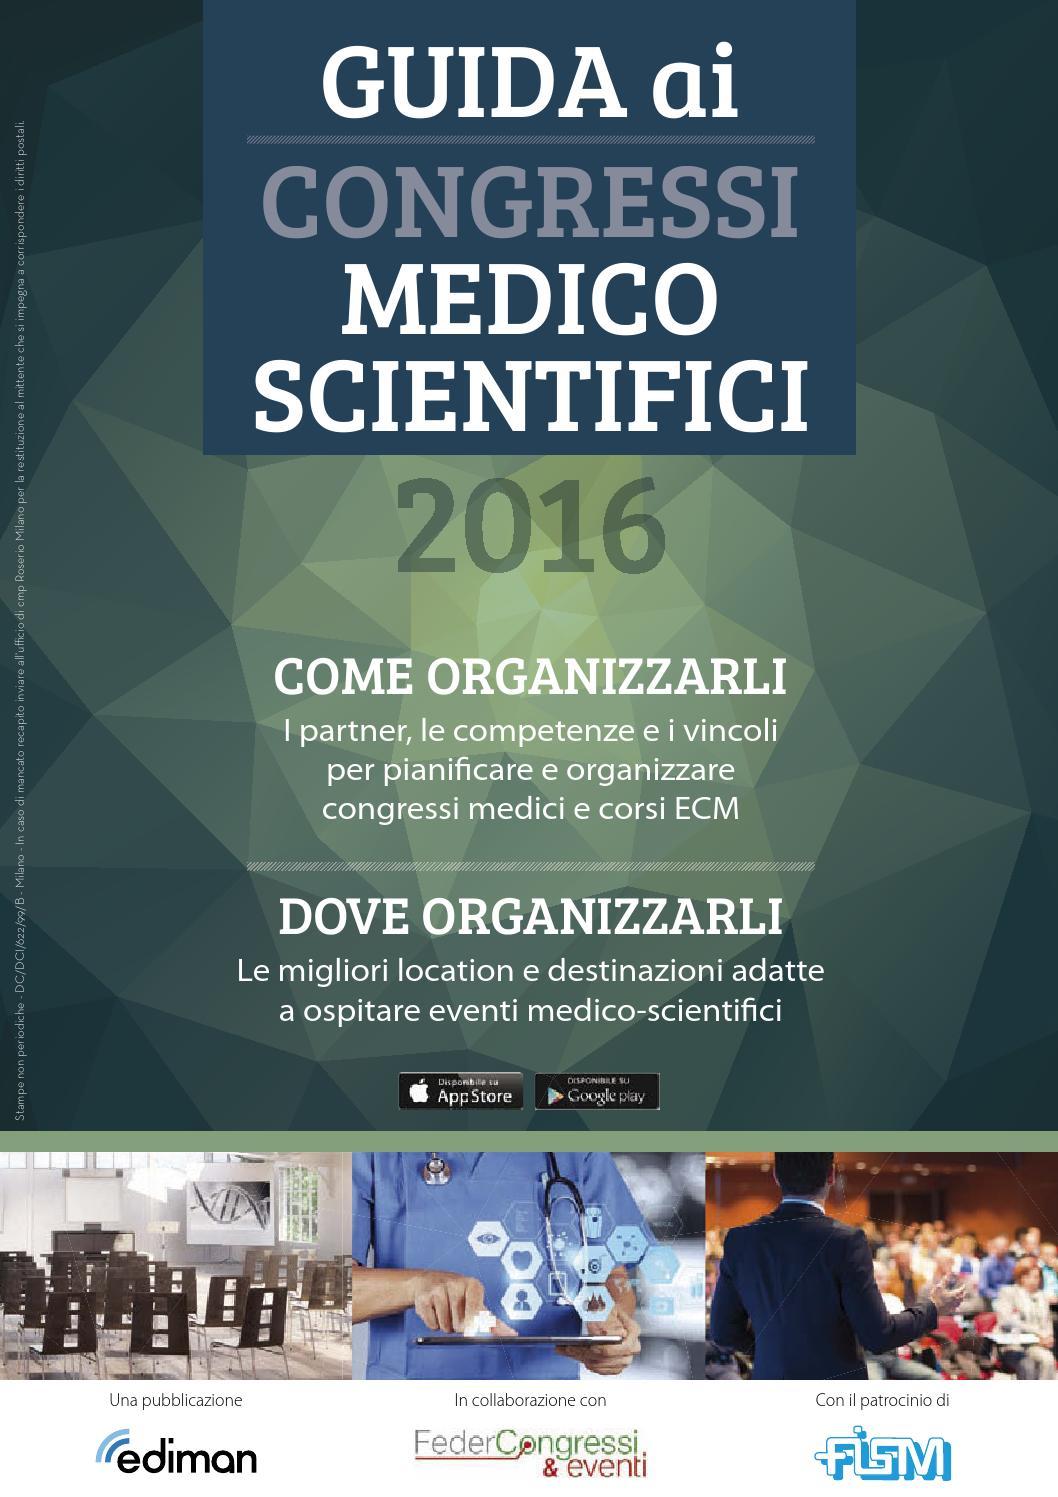 Guida ai Congressi Medico Scientifici 2016 by Ediman - issuu f5fcd610abd